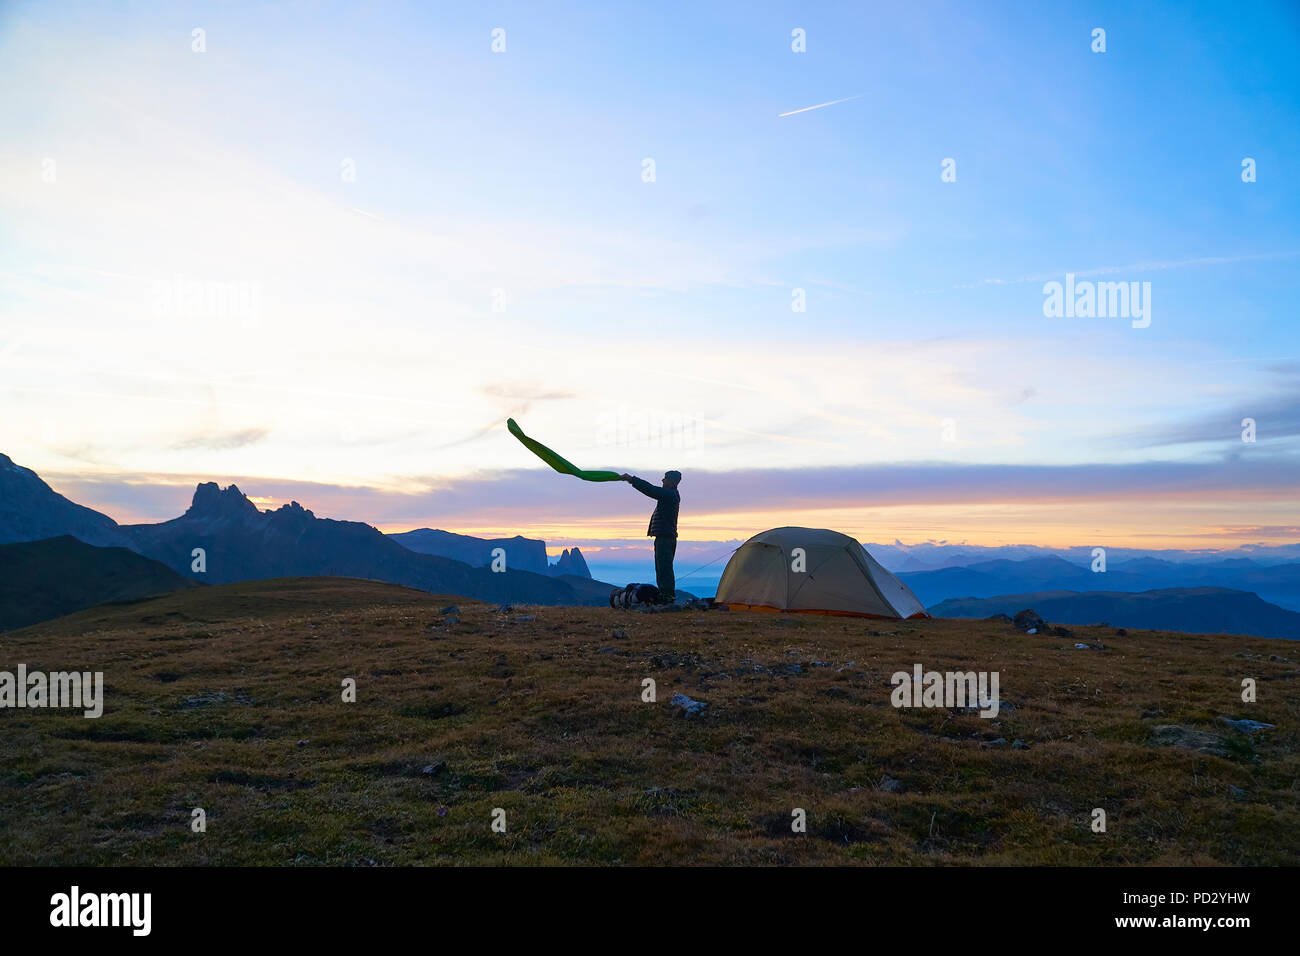 Hiker preparing to camp at sunset, Canazei, Trentino-Alto Adige, Italy - Stock Image